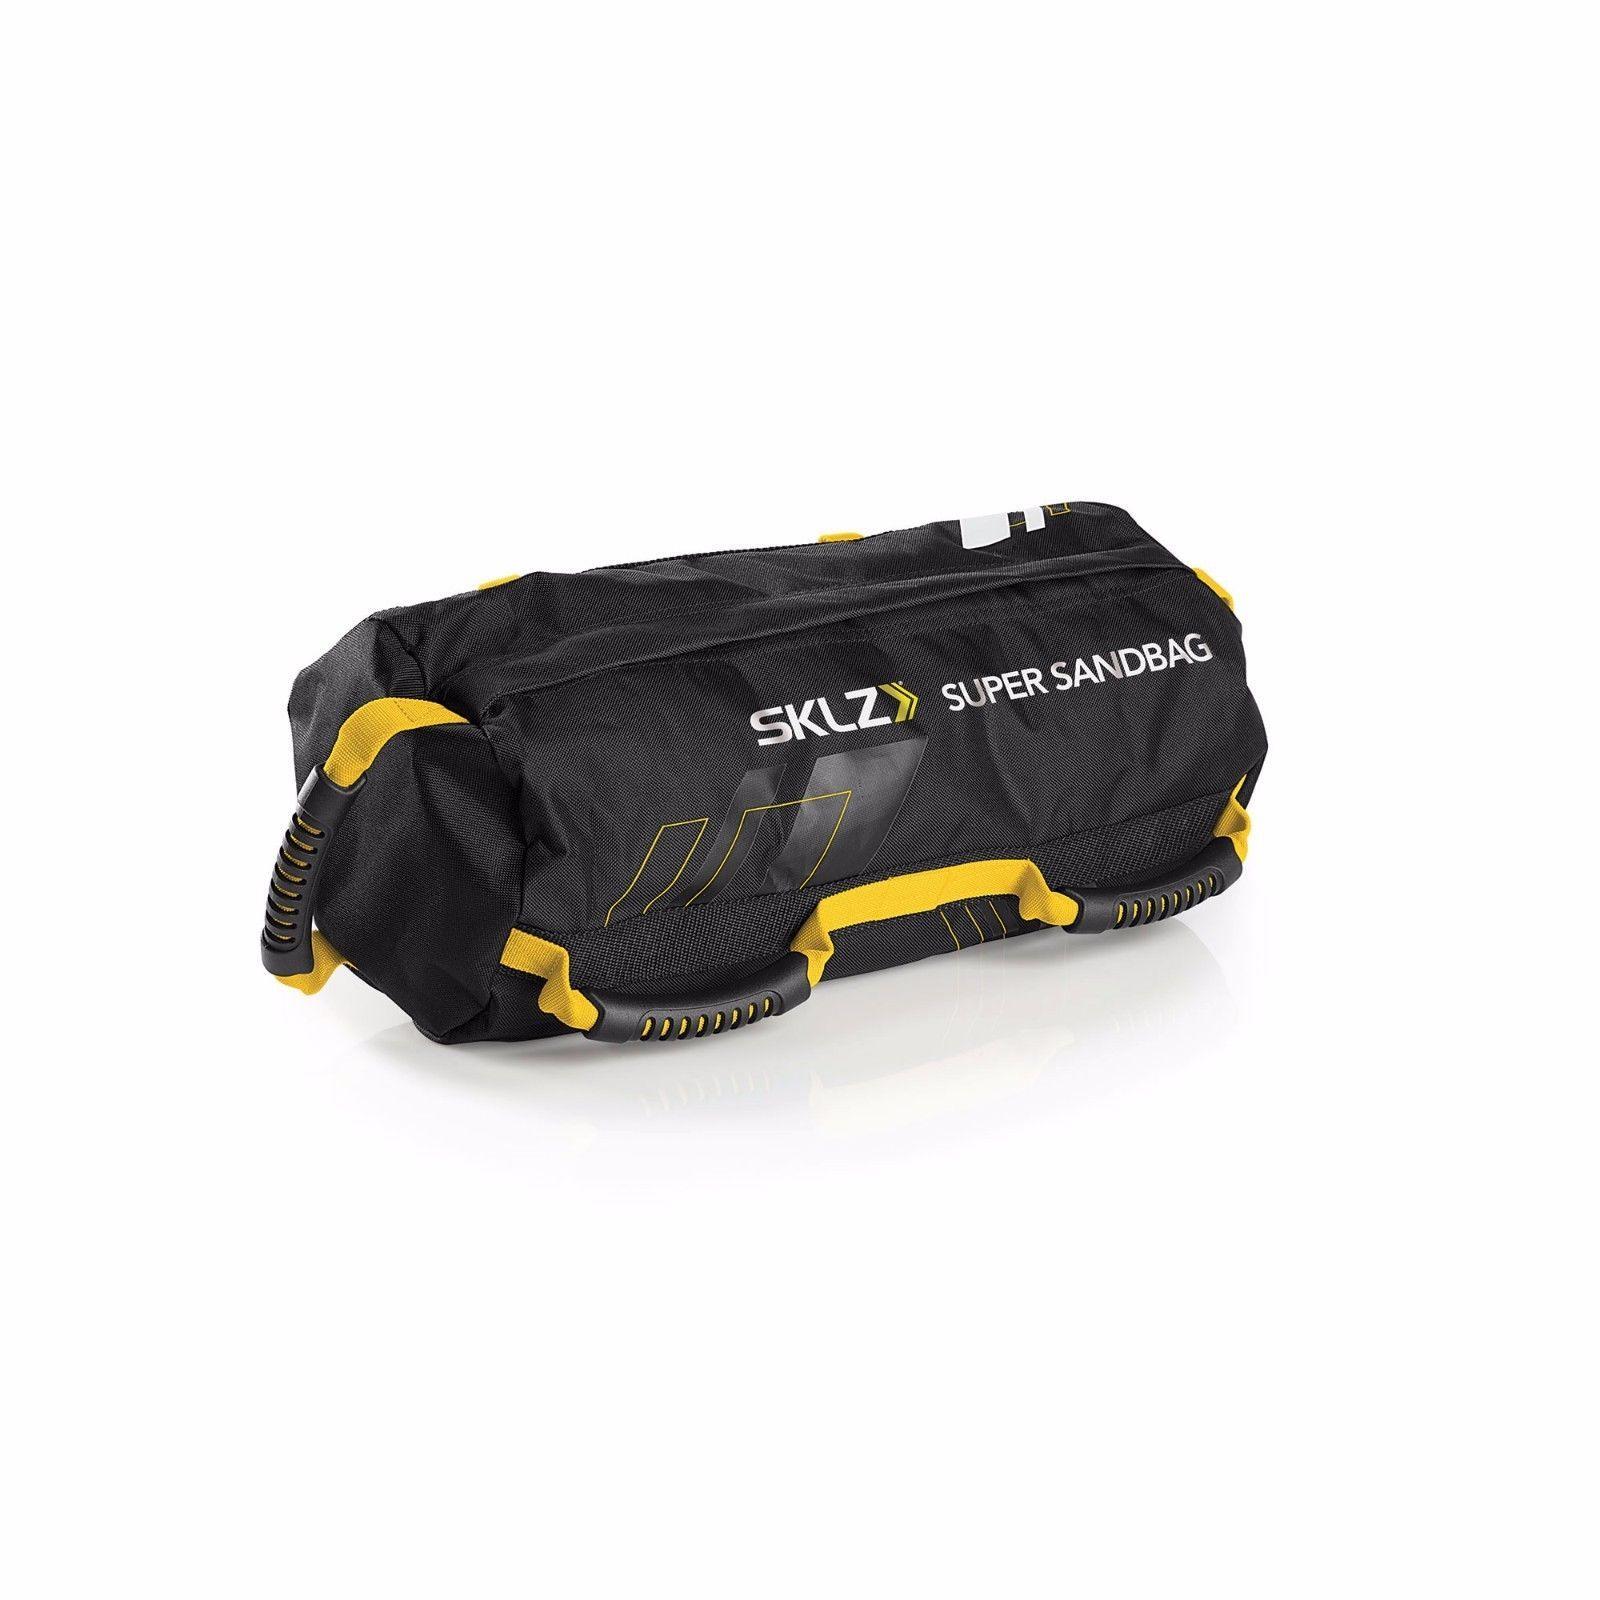 0d5f64ff7501 SKLZ Super Sandbag   Heavy-Duty Training Bag - NEW - SOLD & SHIPPED ...